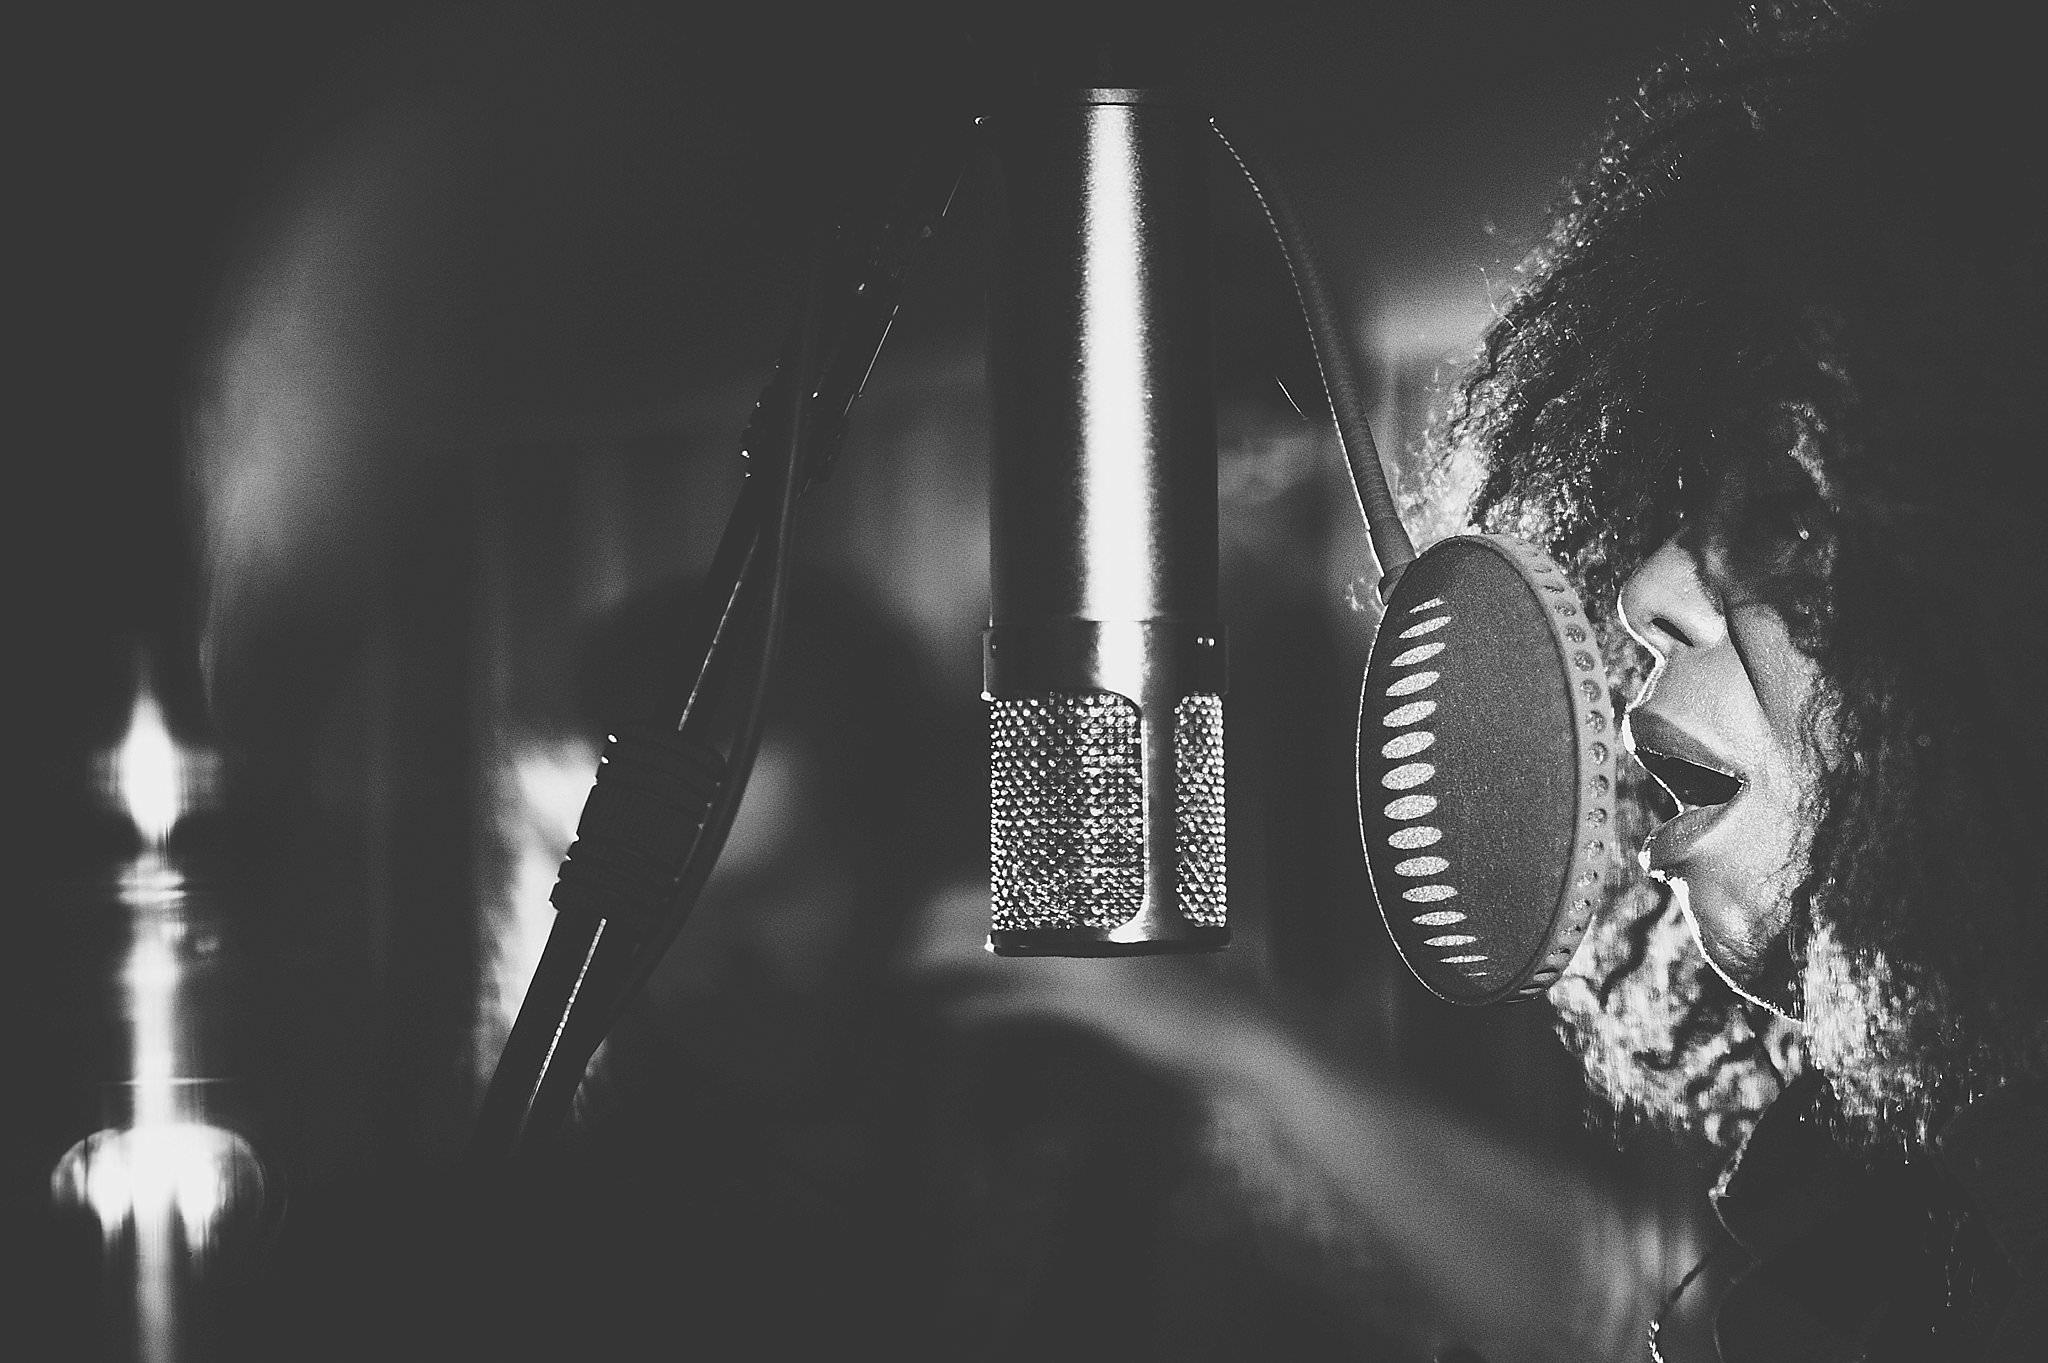 aga-tomaszek-music-photographer-cardiff_1240